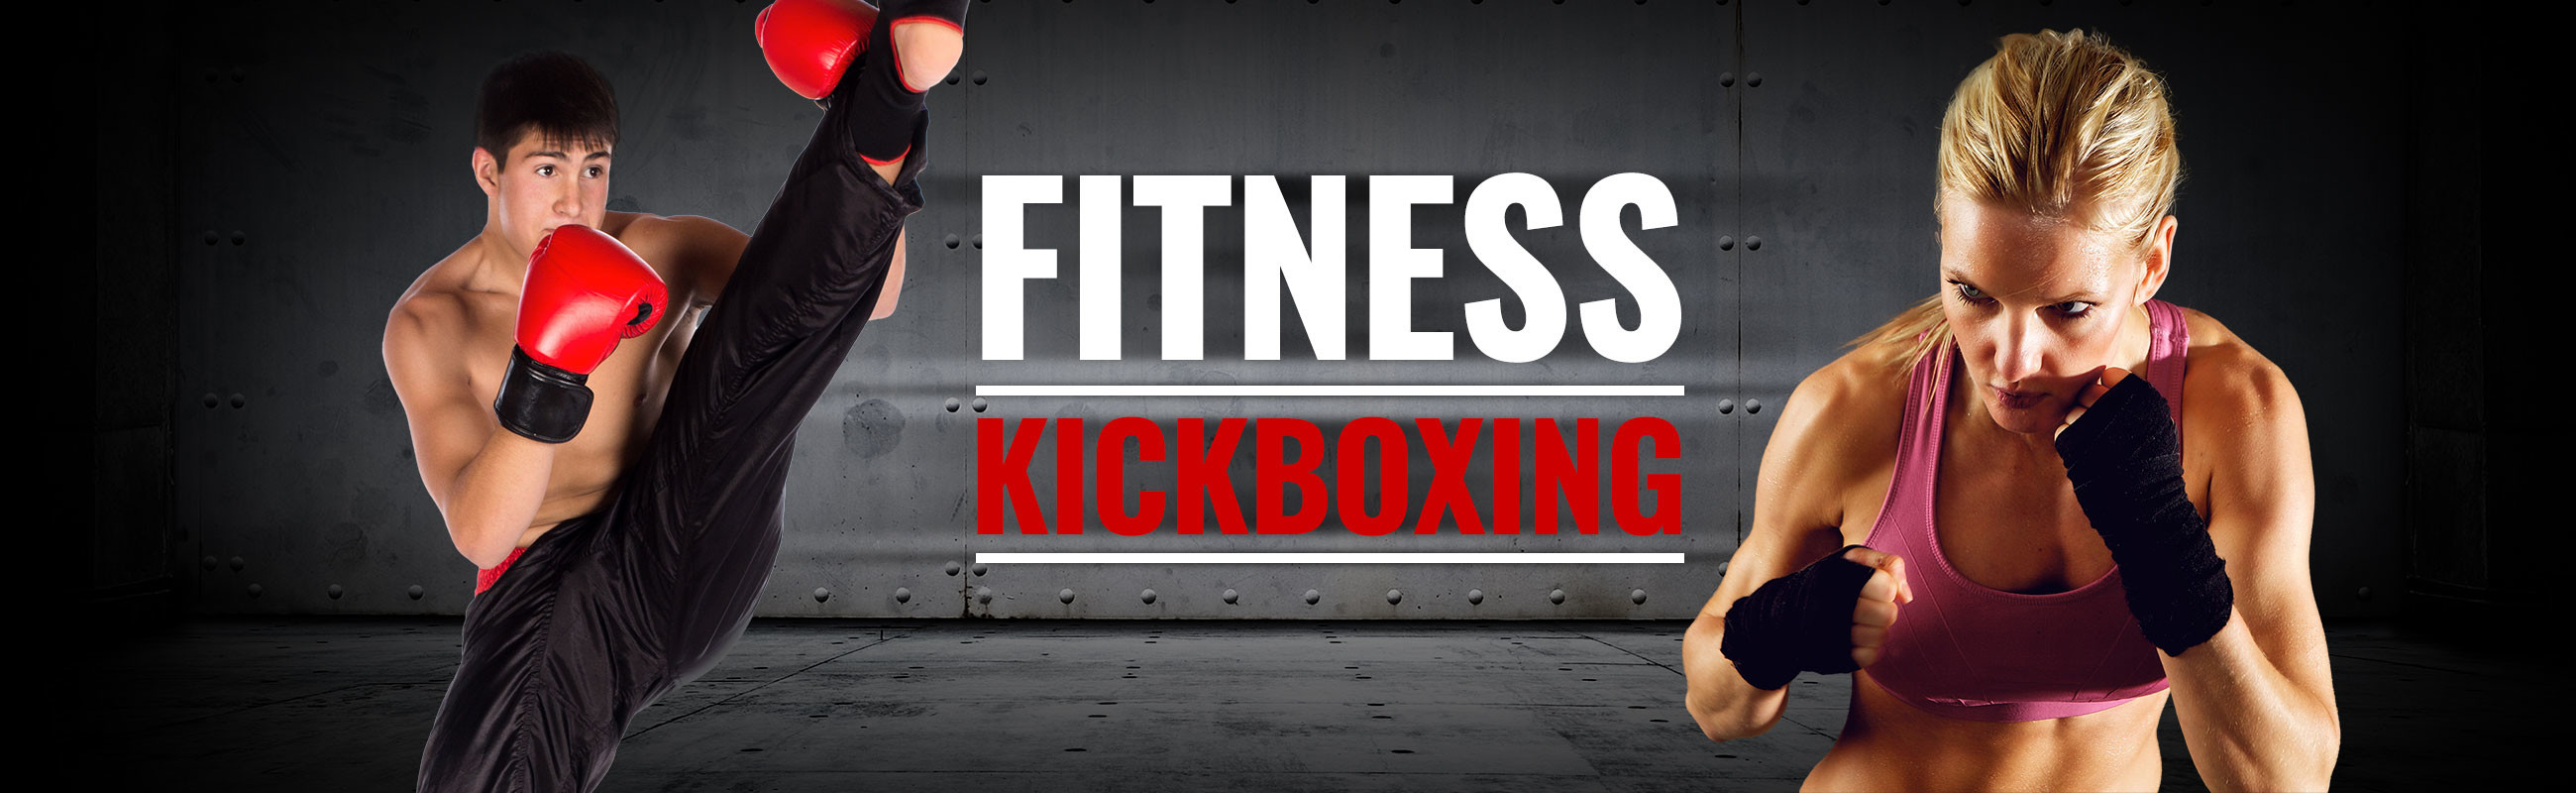 fitness-kickboxing